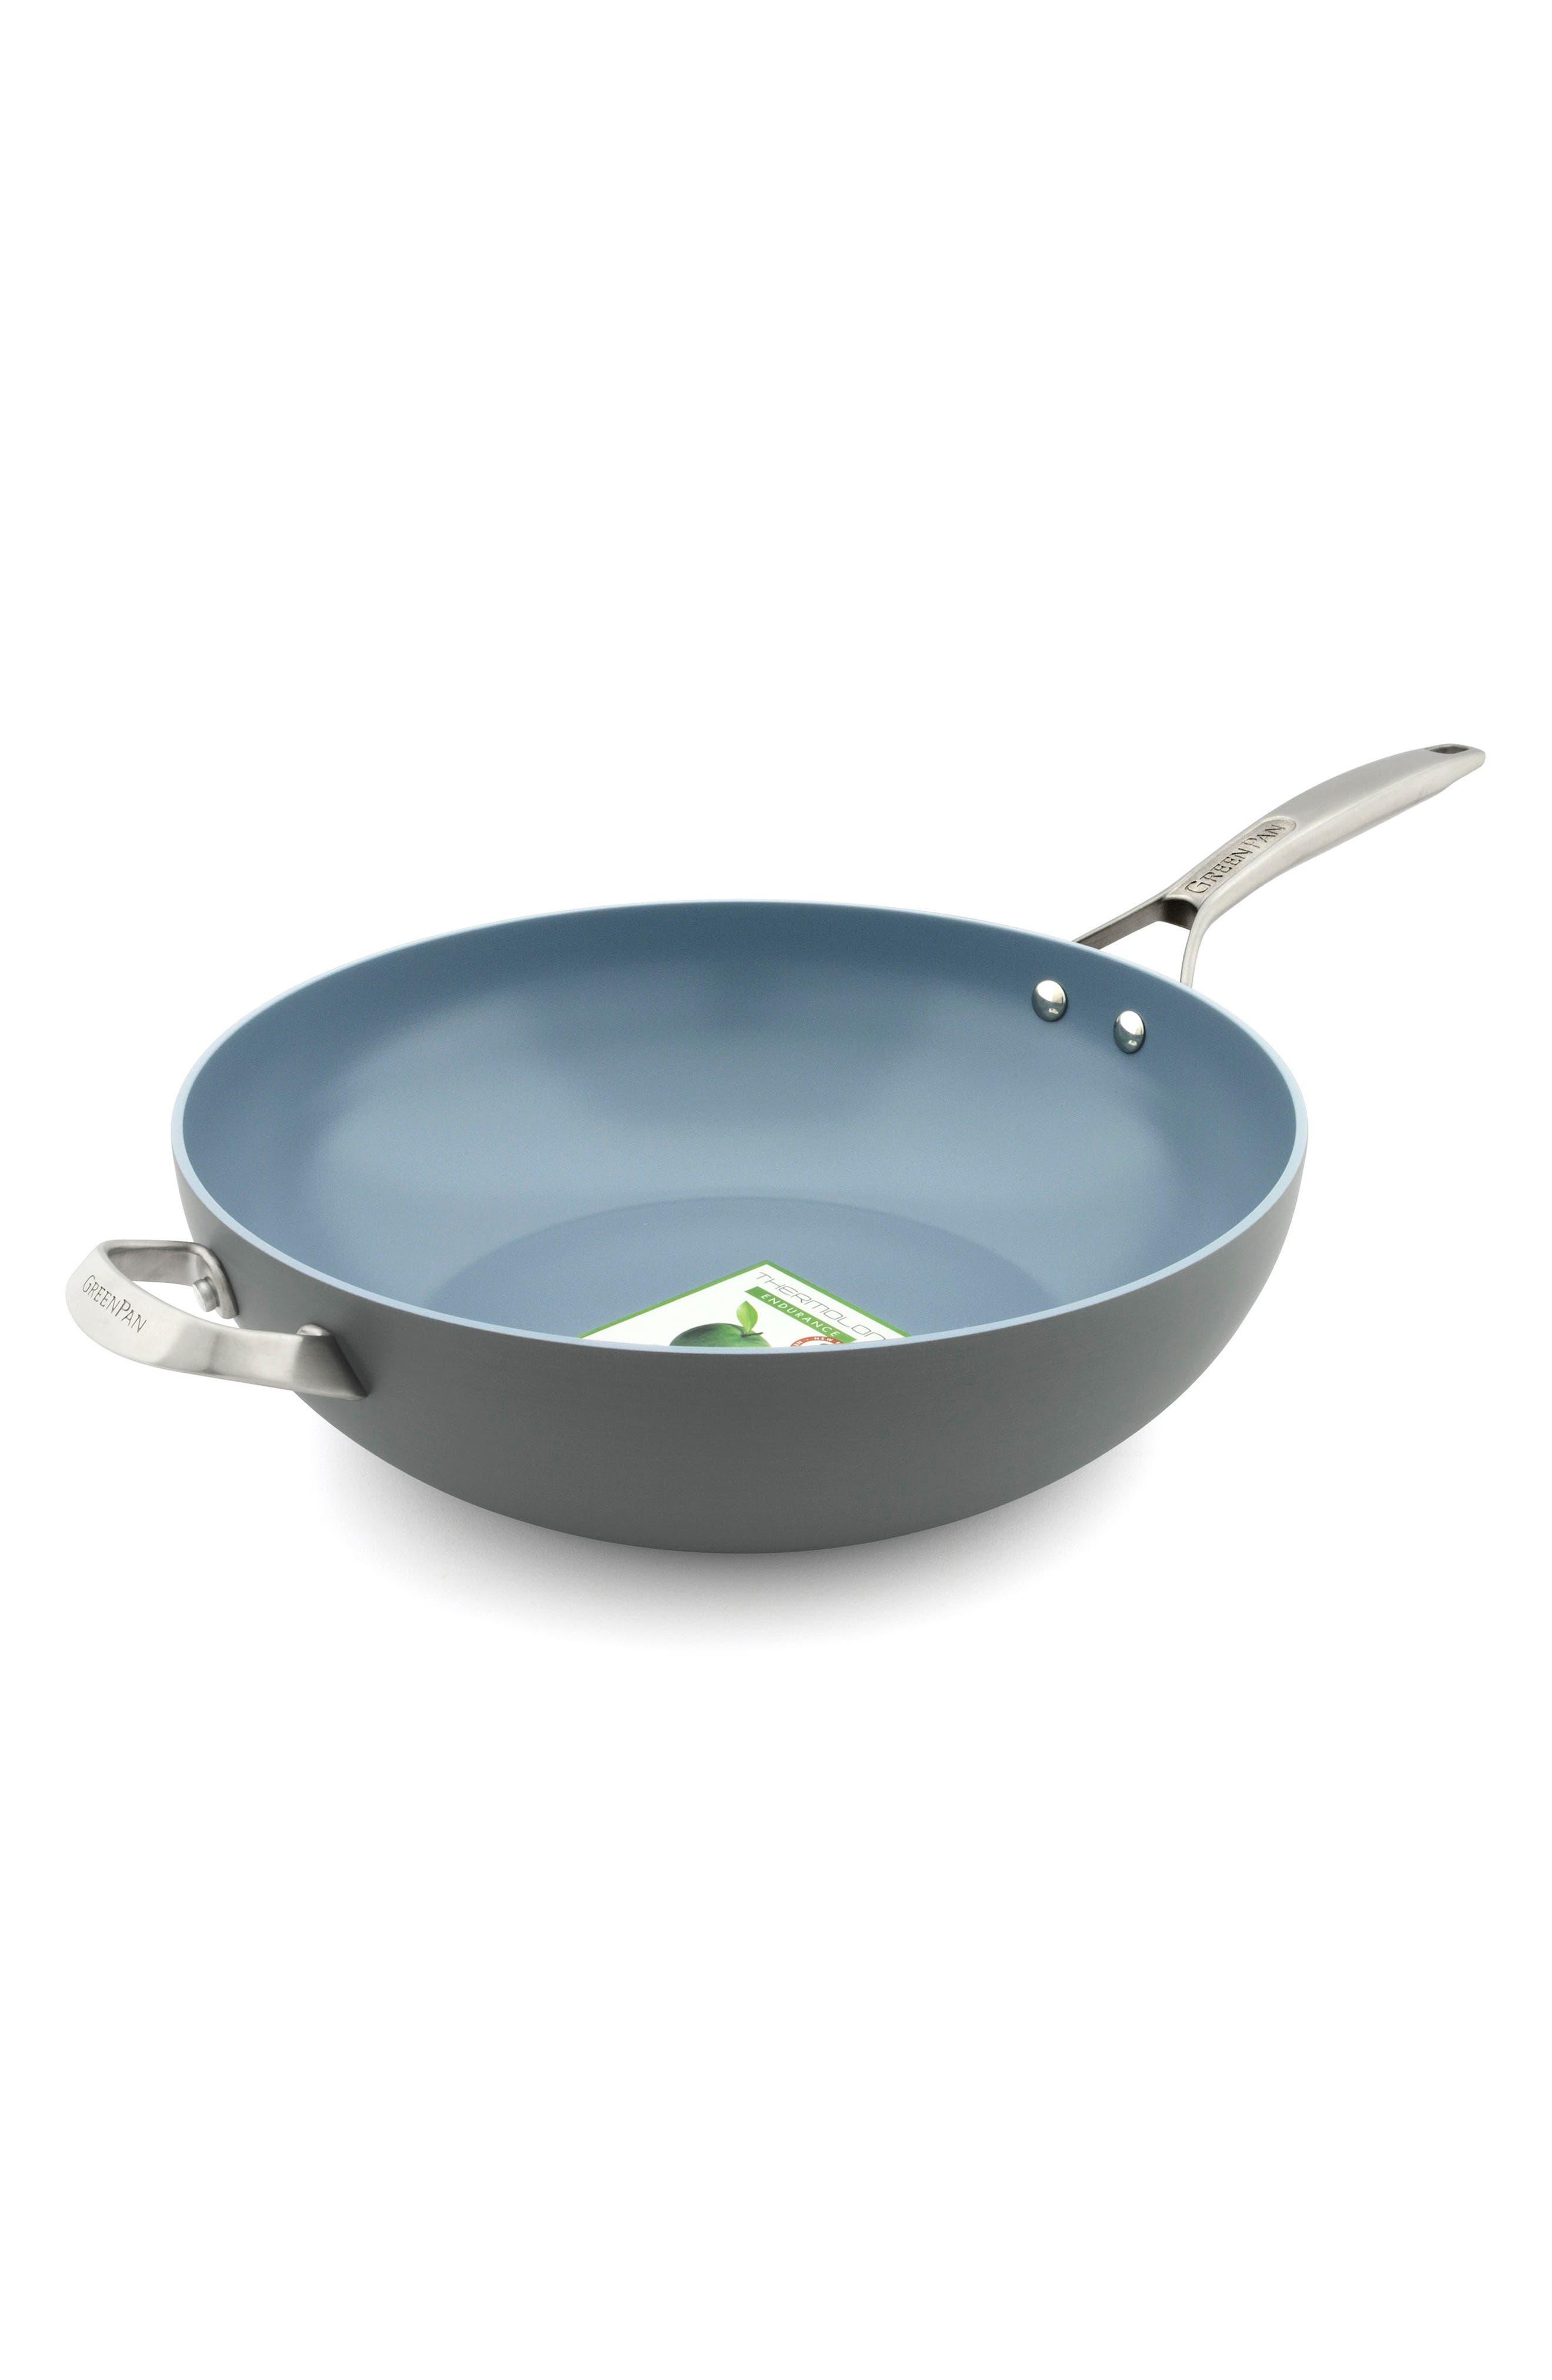 Main Image - GreenPan Paris 12 1/2-Inch Anodized Aluminum Ceramic Nonstick Wok